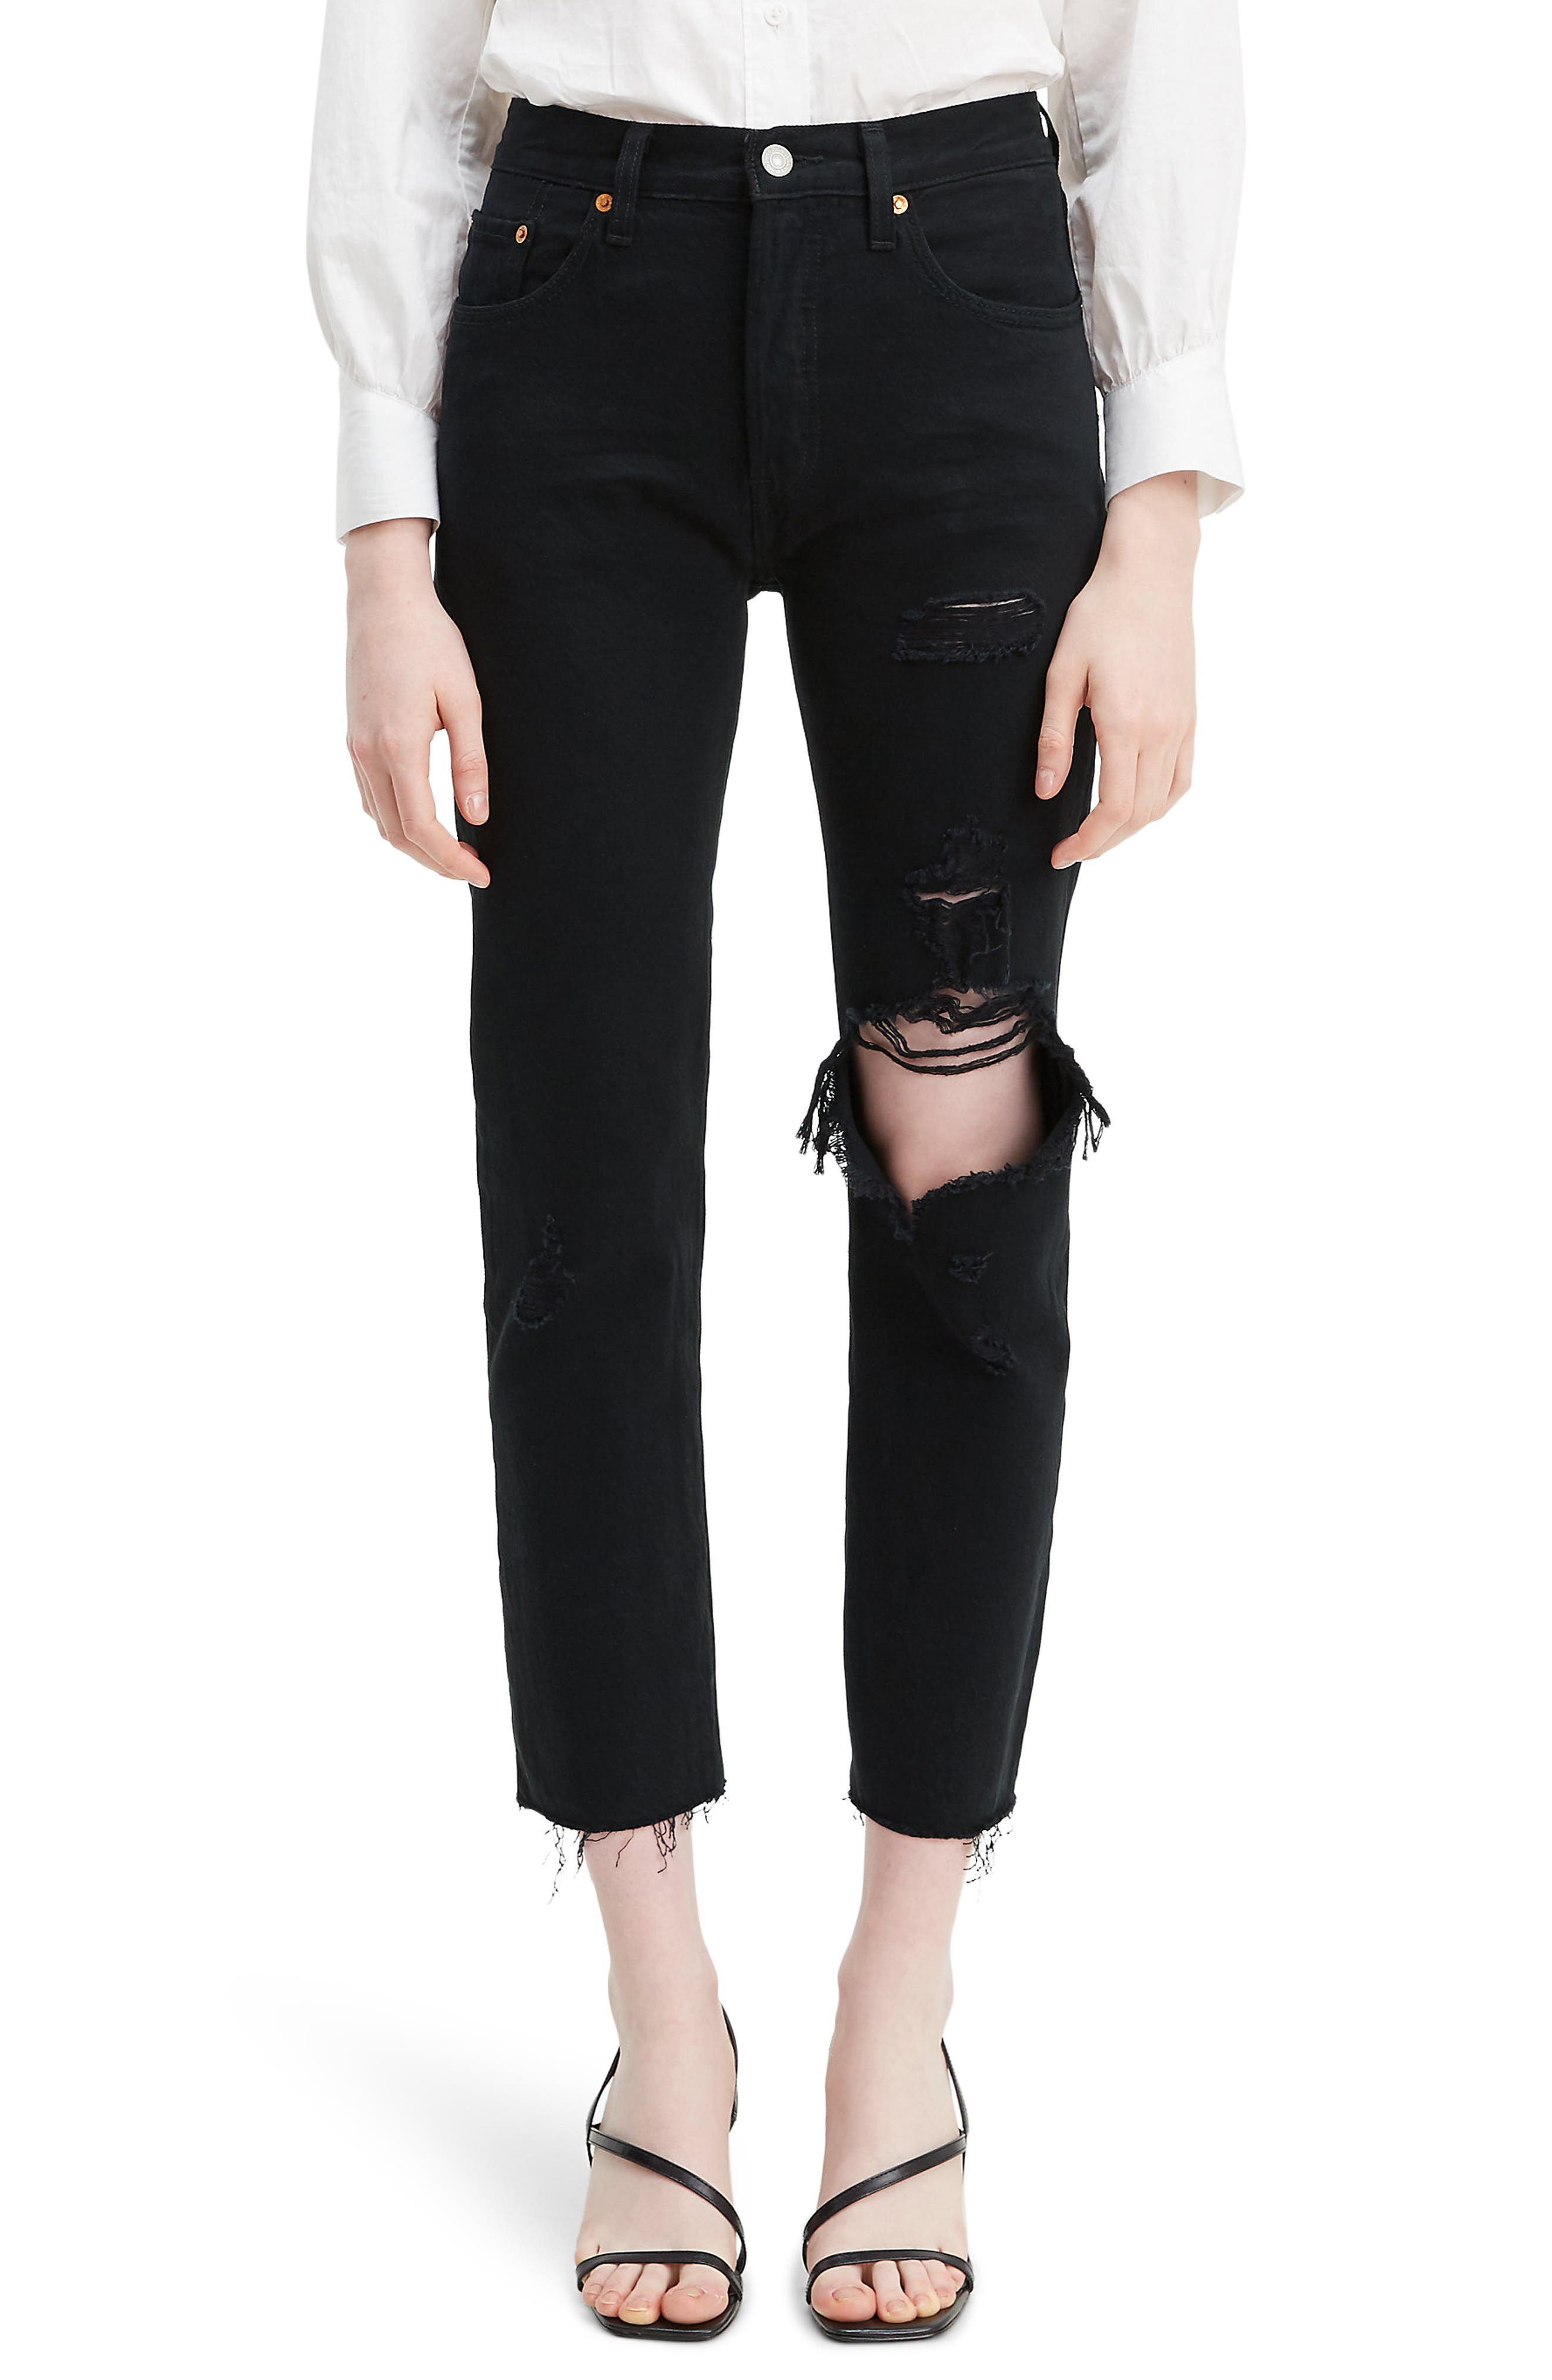 Women's Levi's 501 High Waist Ripped Crop Straight Leg Jeans,  30 x 26 - Black